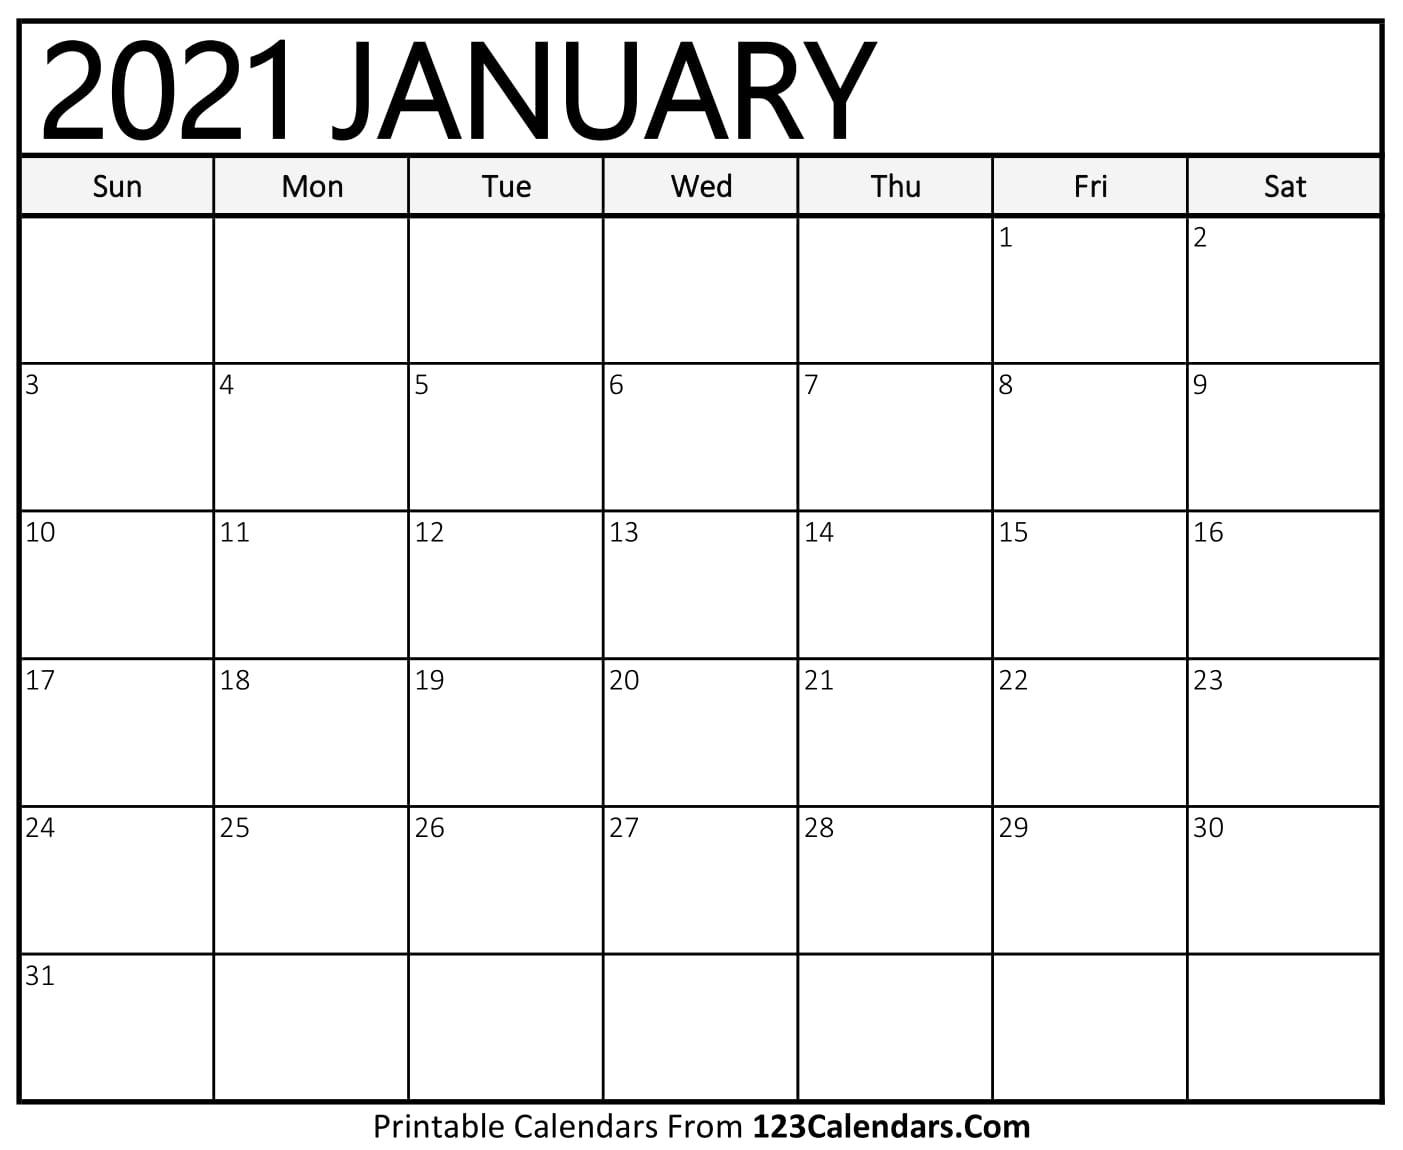 2021 Printable Calendar | 123Calendars in Calendar November December January Space To Write At The Side